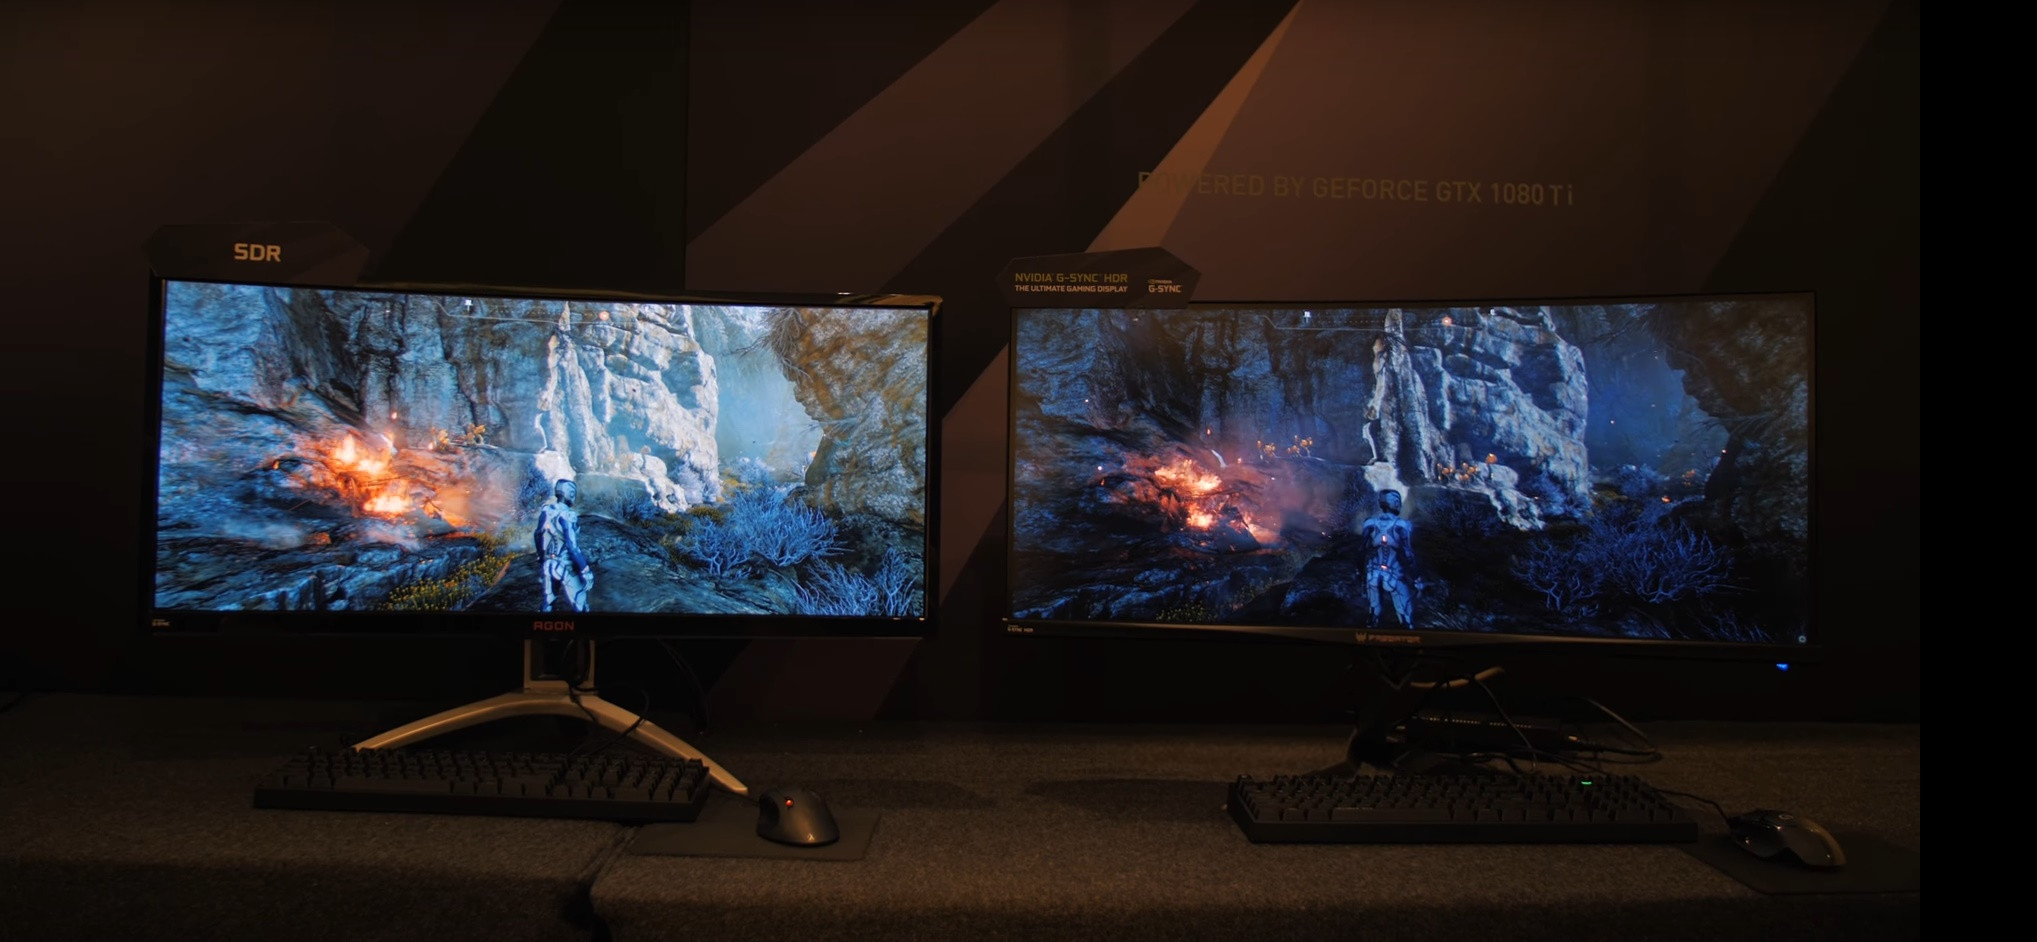 NVIDIA Deliberately Worsens SDR Monitor Image Settings to